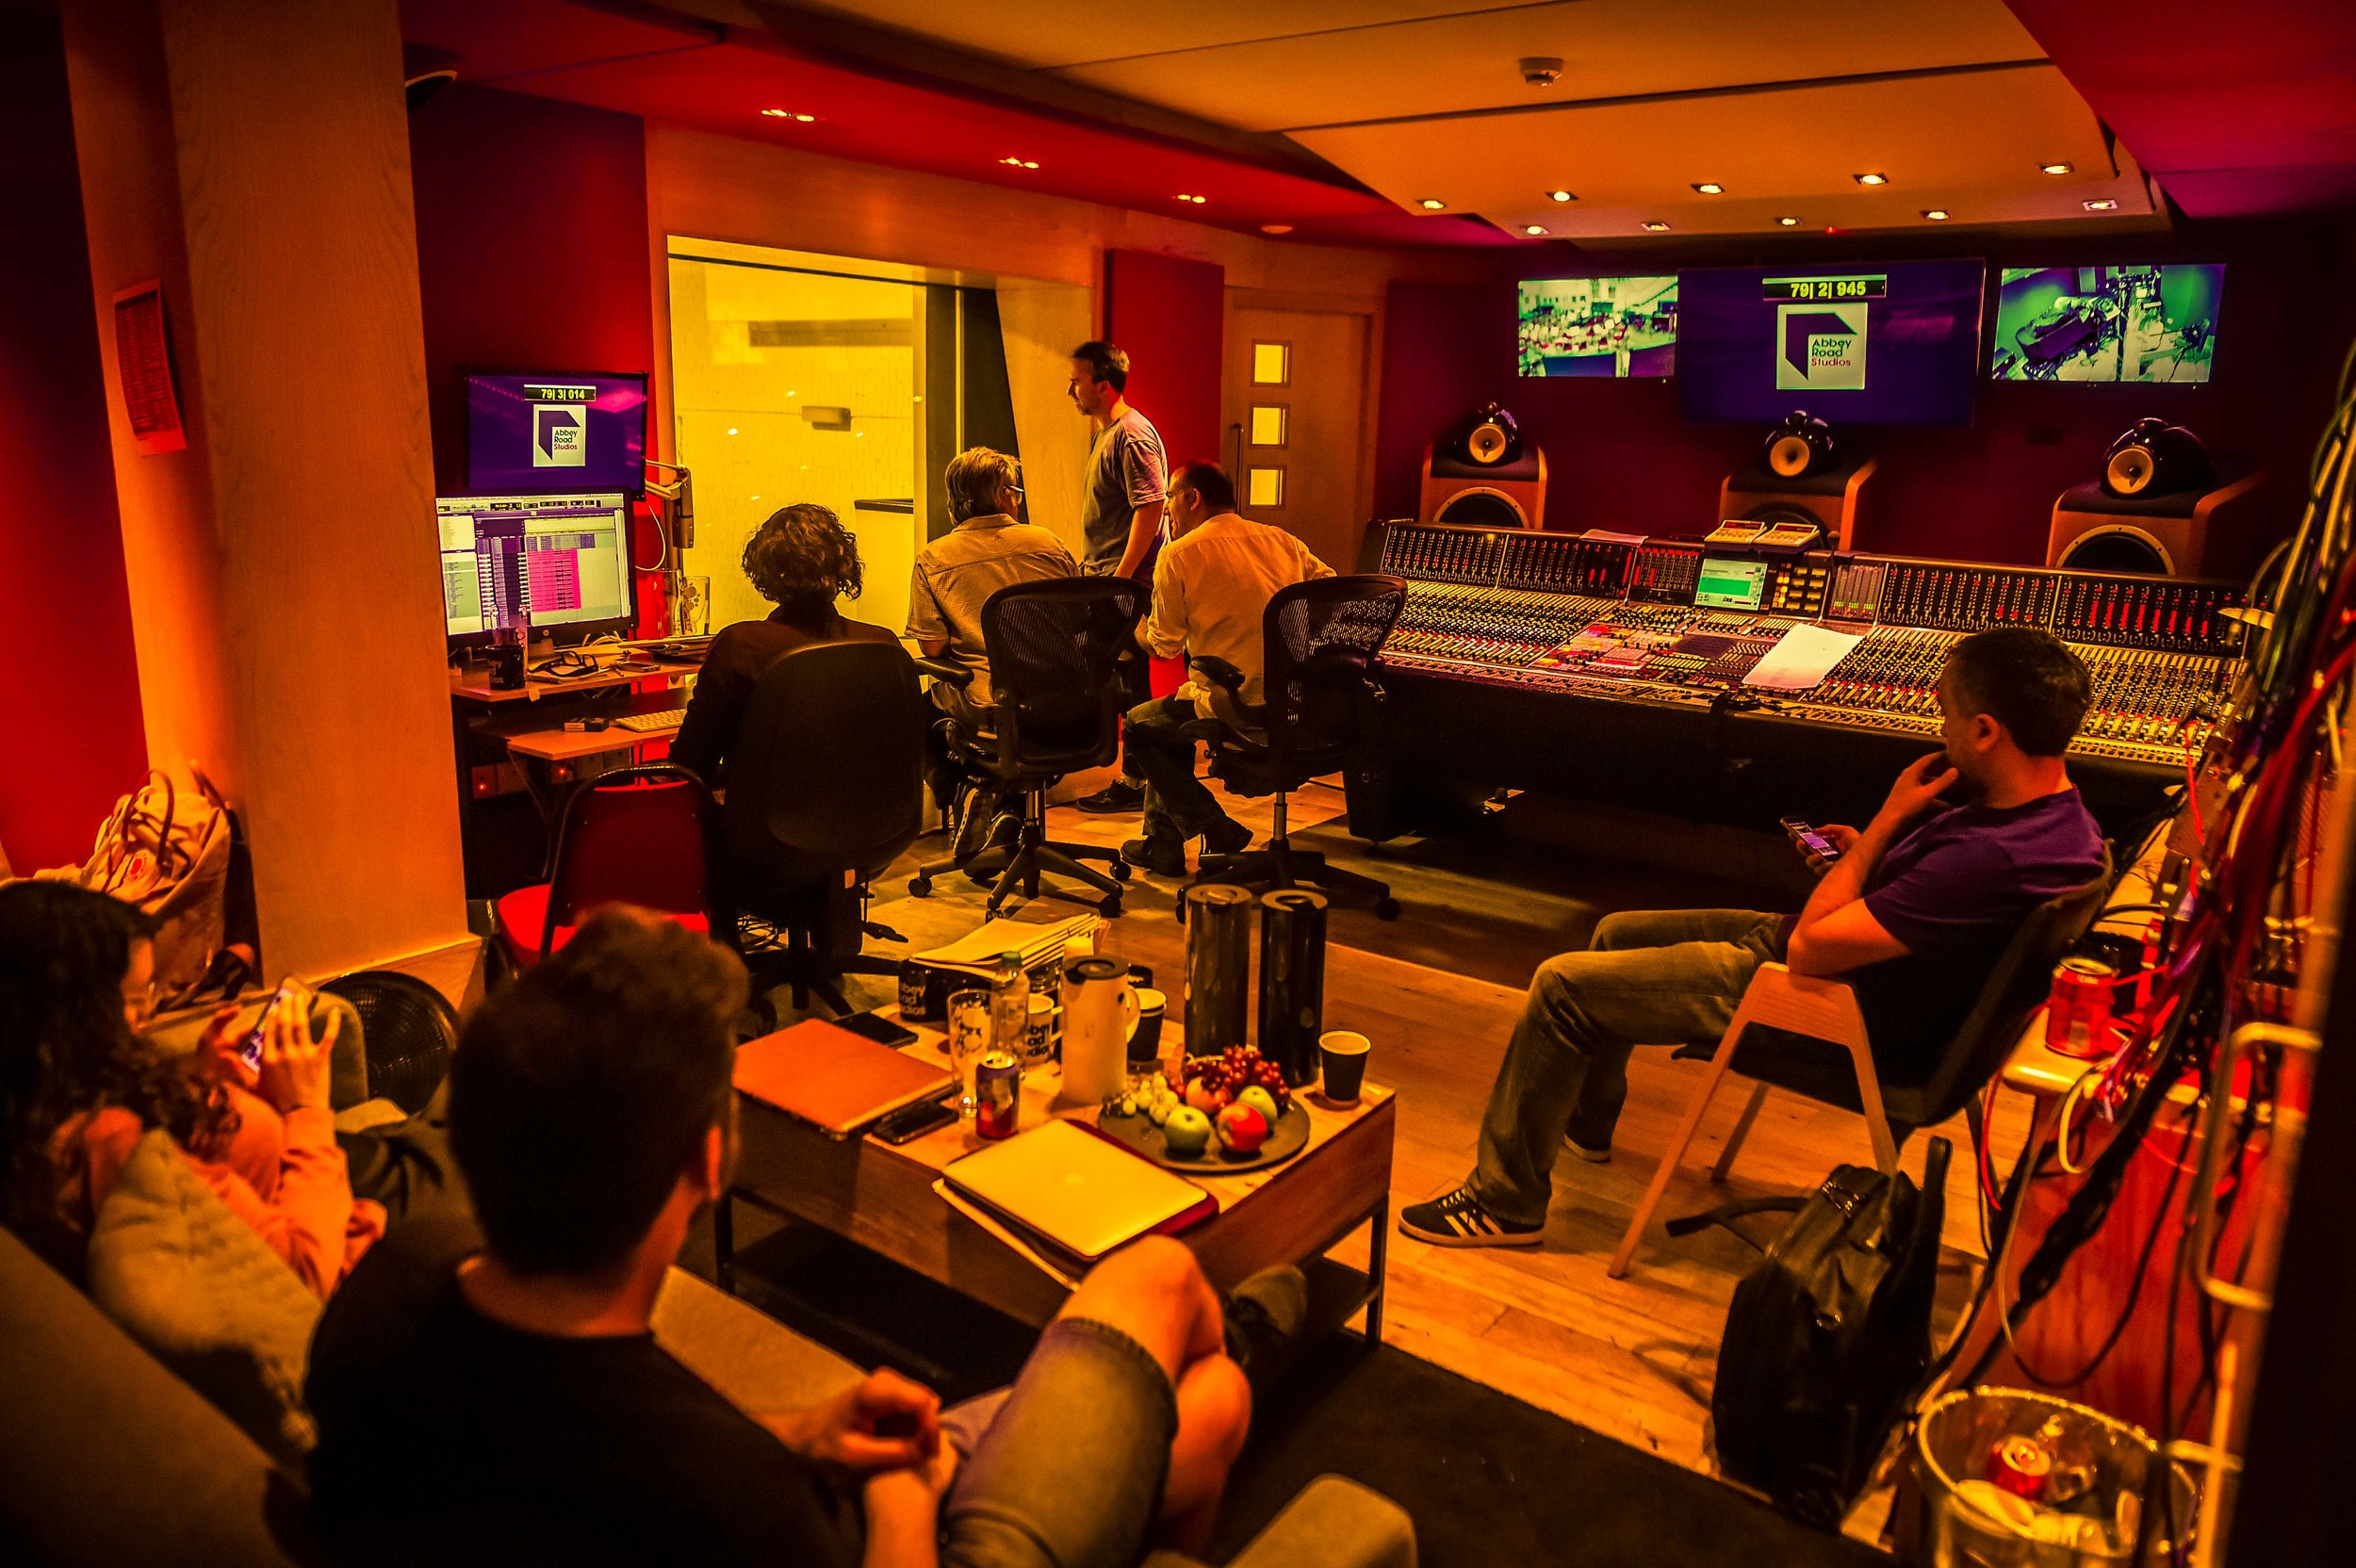 Studio 2 Control Room